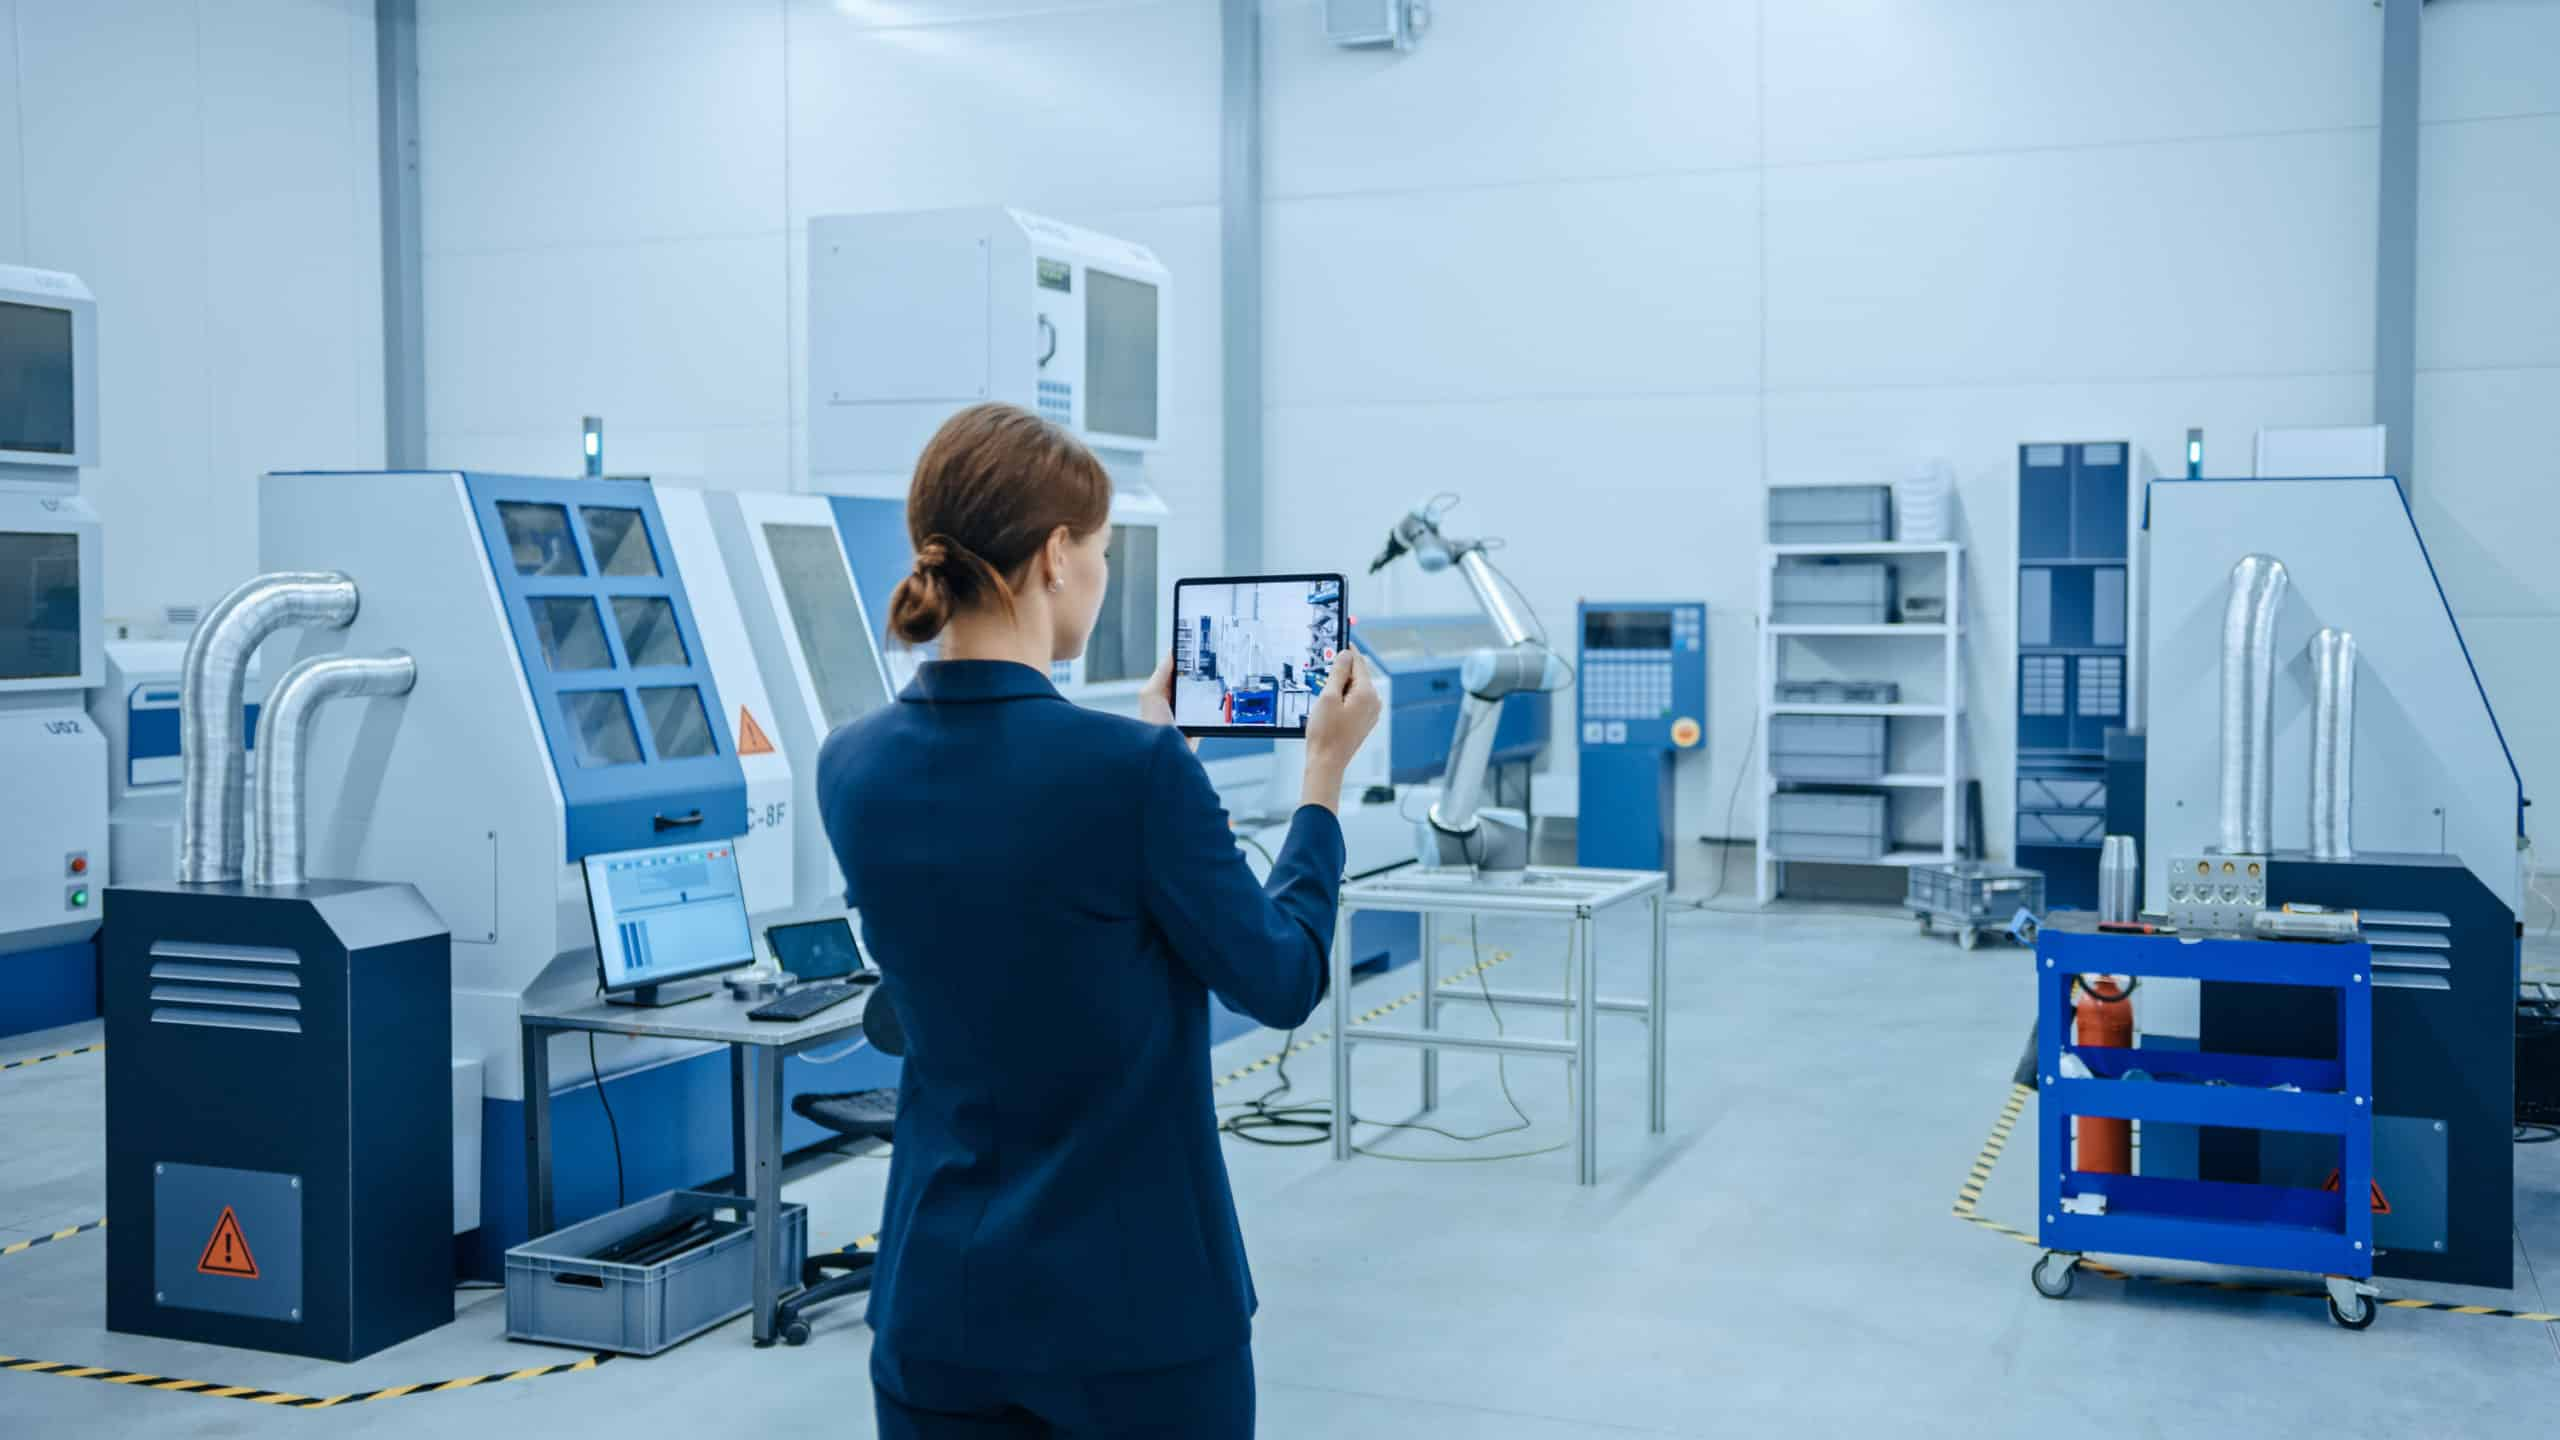 mobile scanning or visualization of 3d factory model